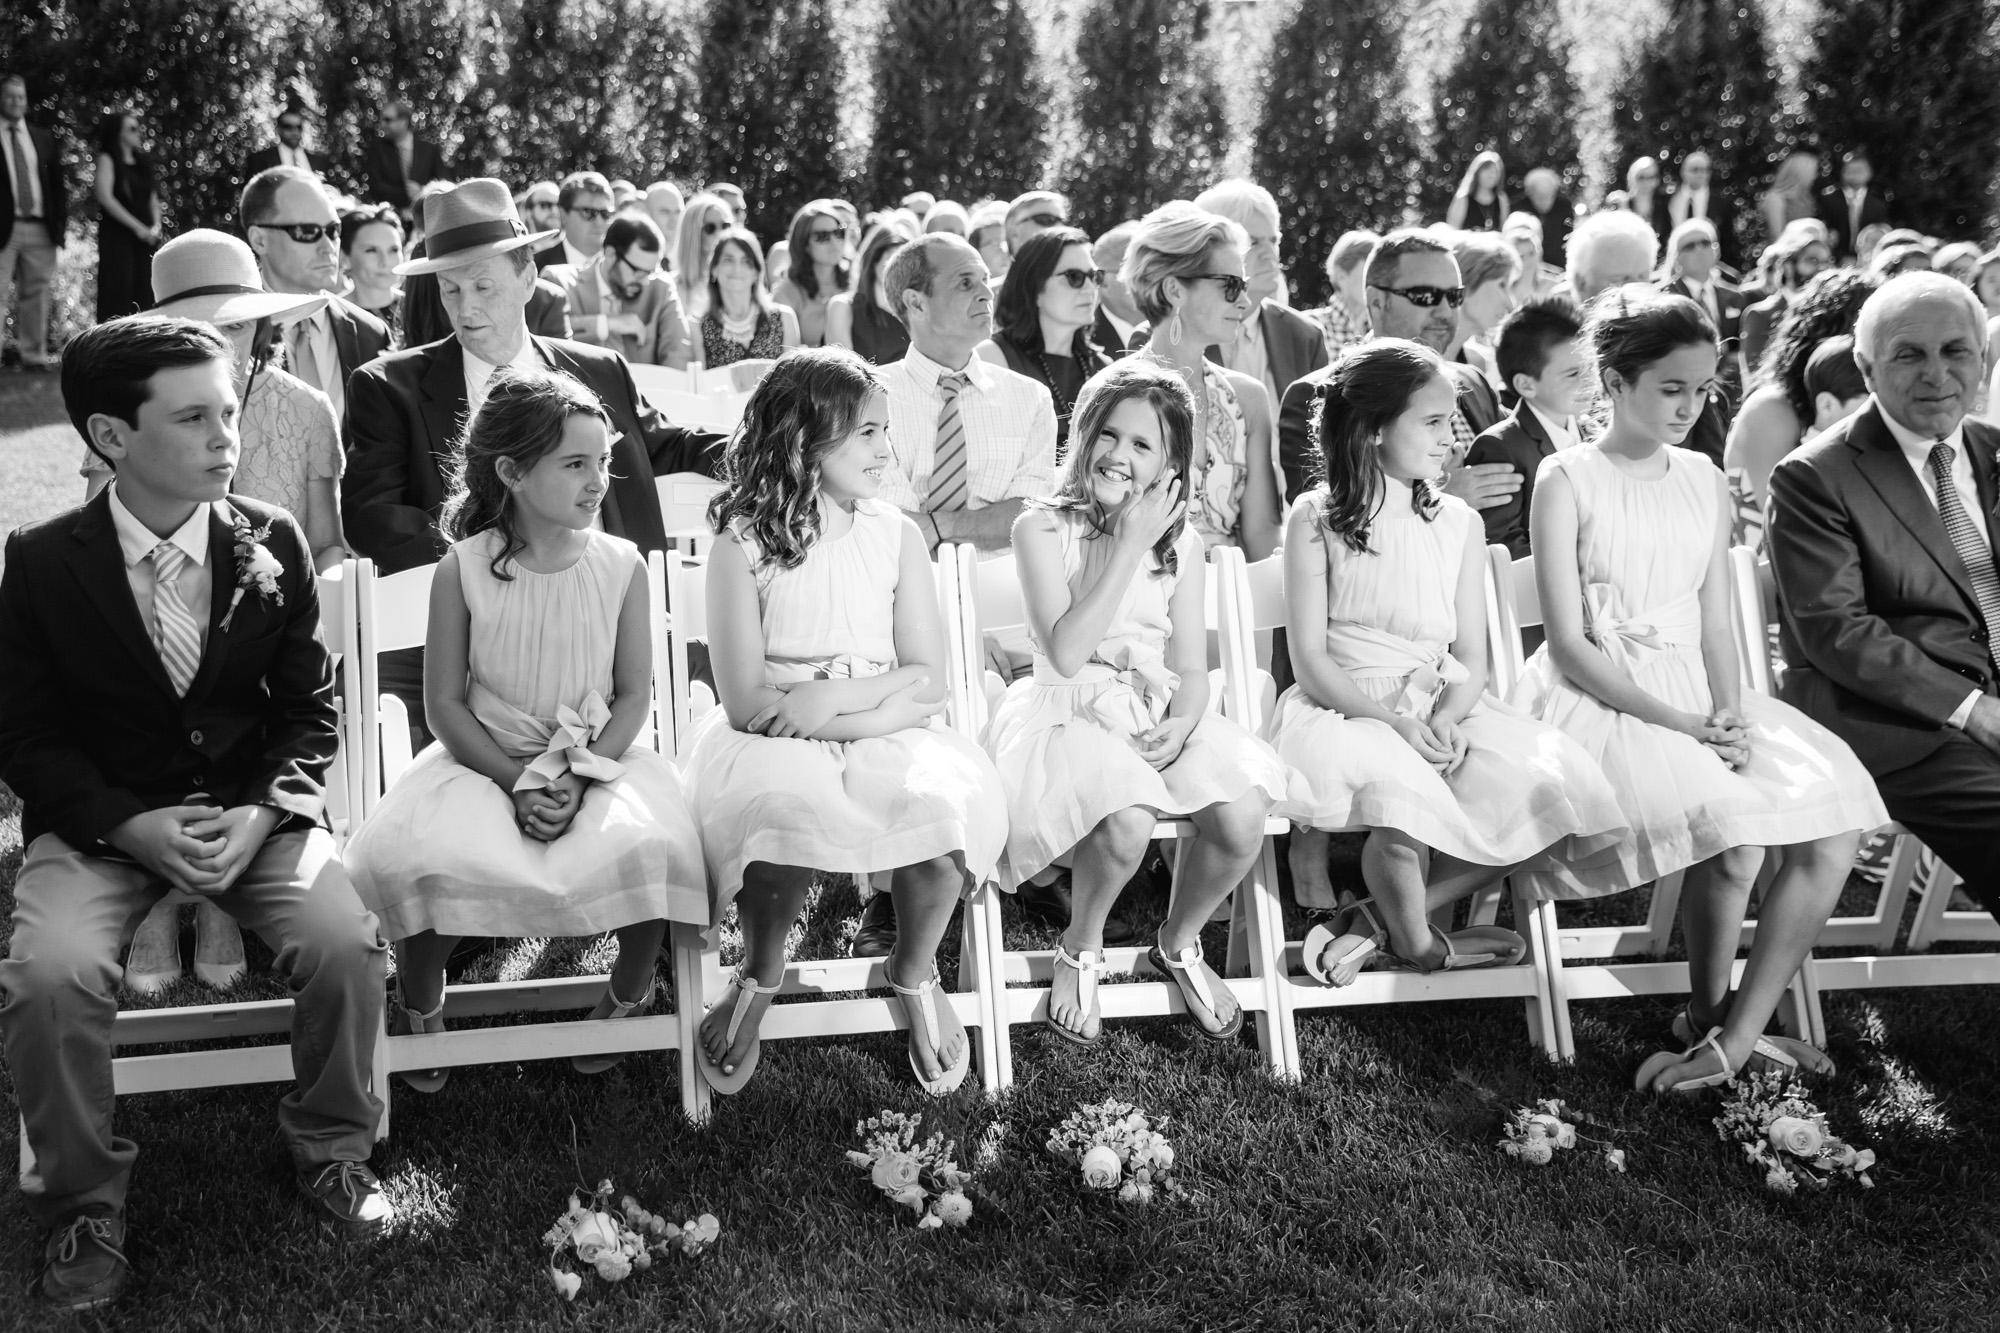 45_Rowan_Brian_The_Roundhouse_Wedding_Beacon_NY_Tanya_Salazar_Photography_564.jpg